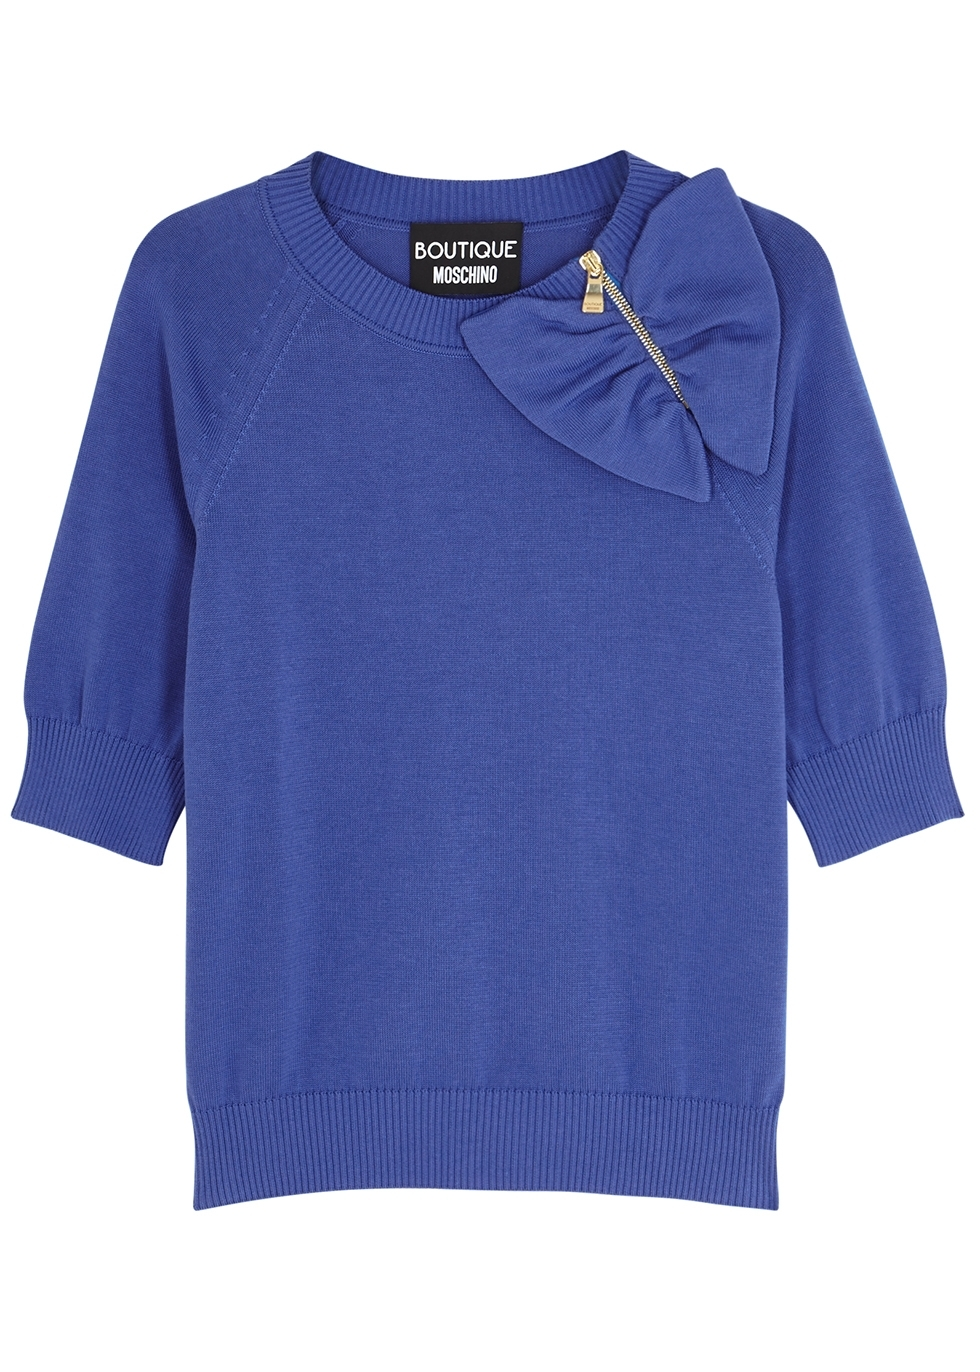 c4fc2c2e644 Boutique Moschino - Italian Designer Brands - Harvey Nichols